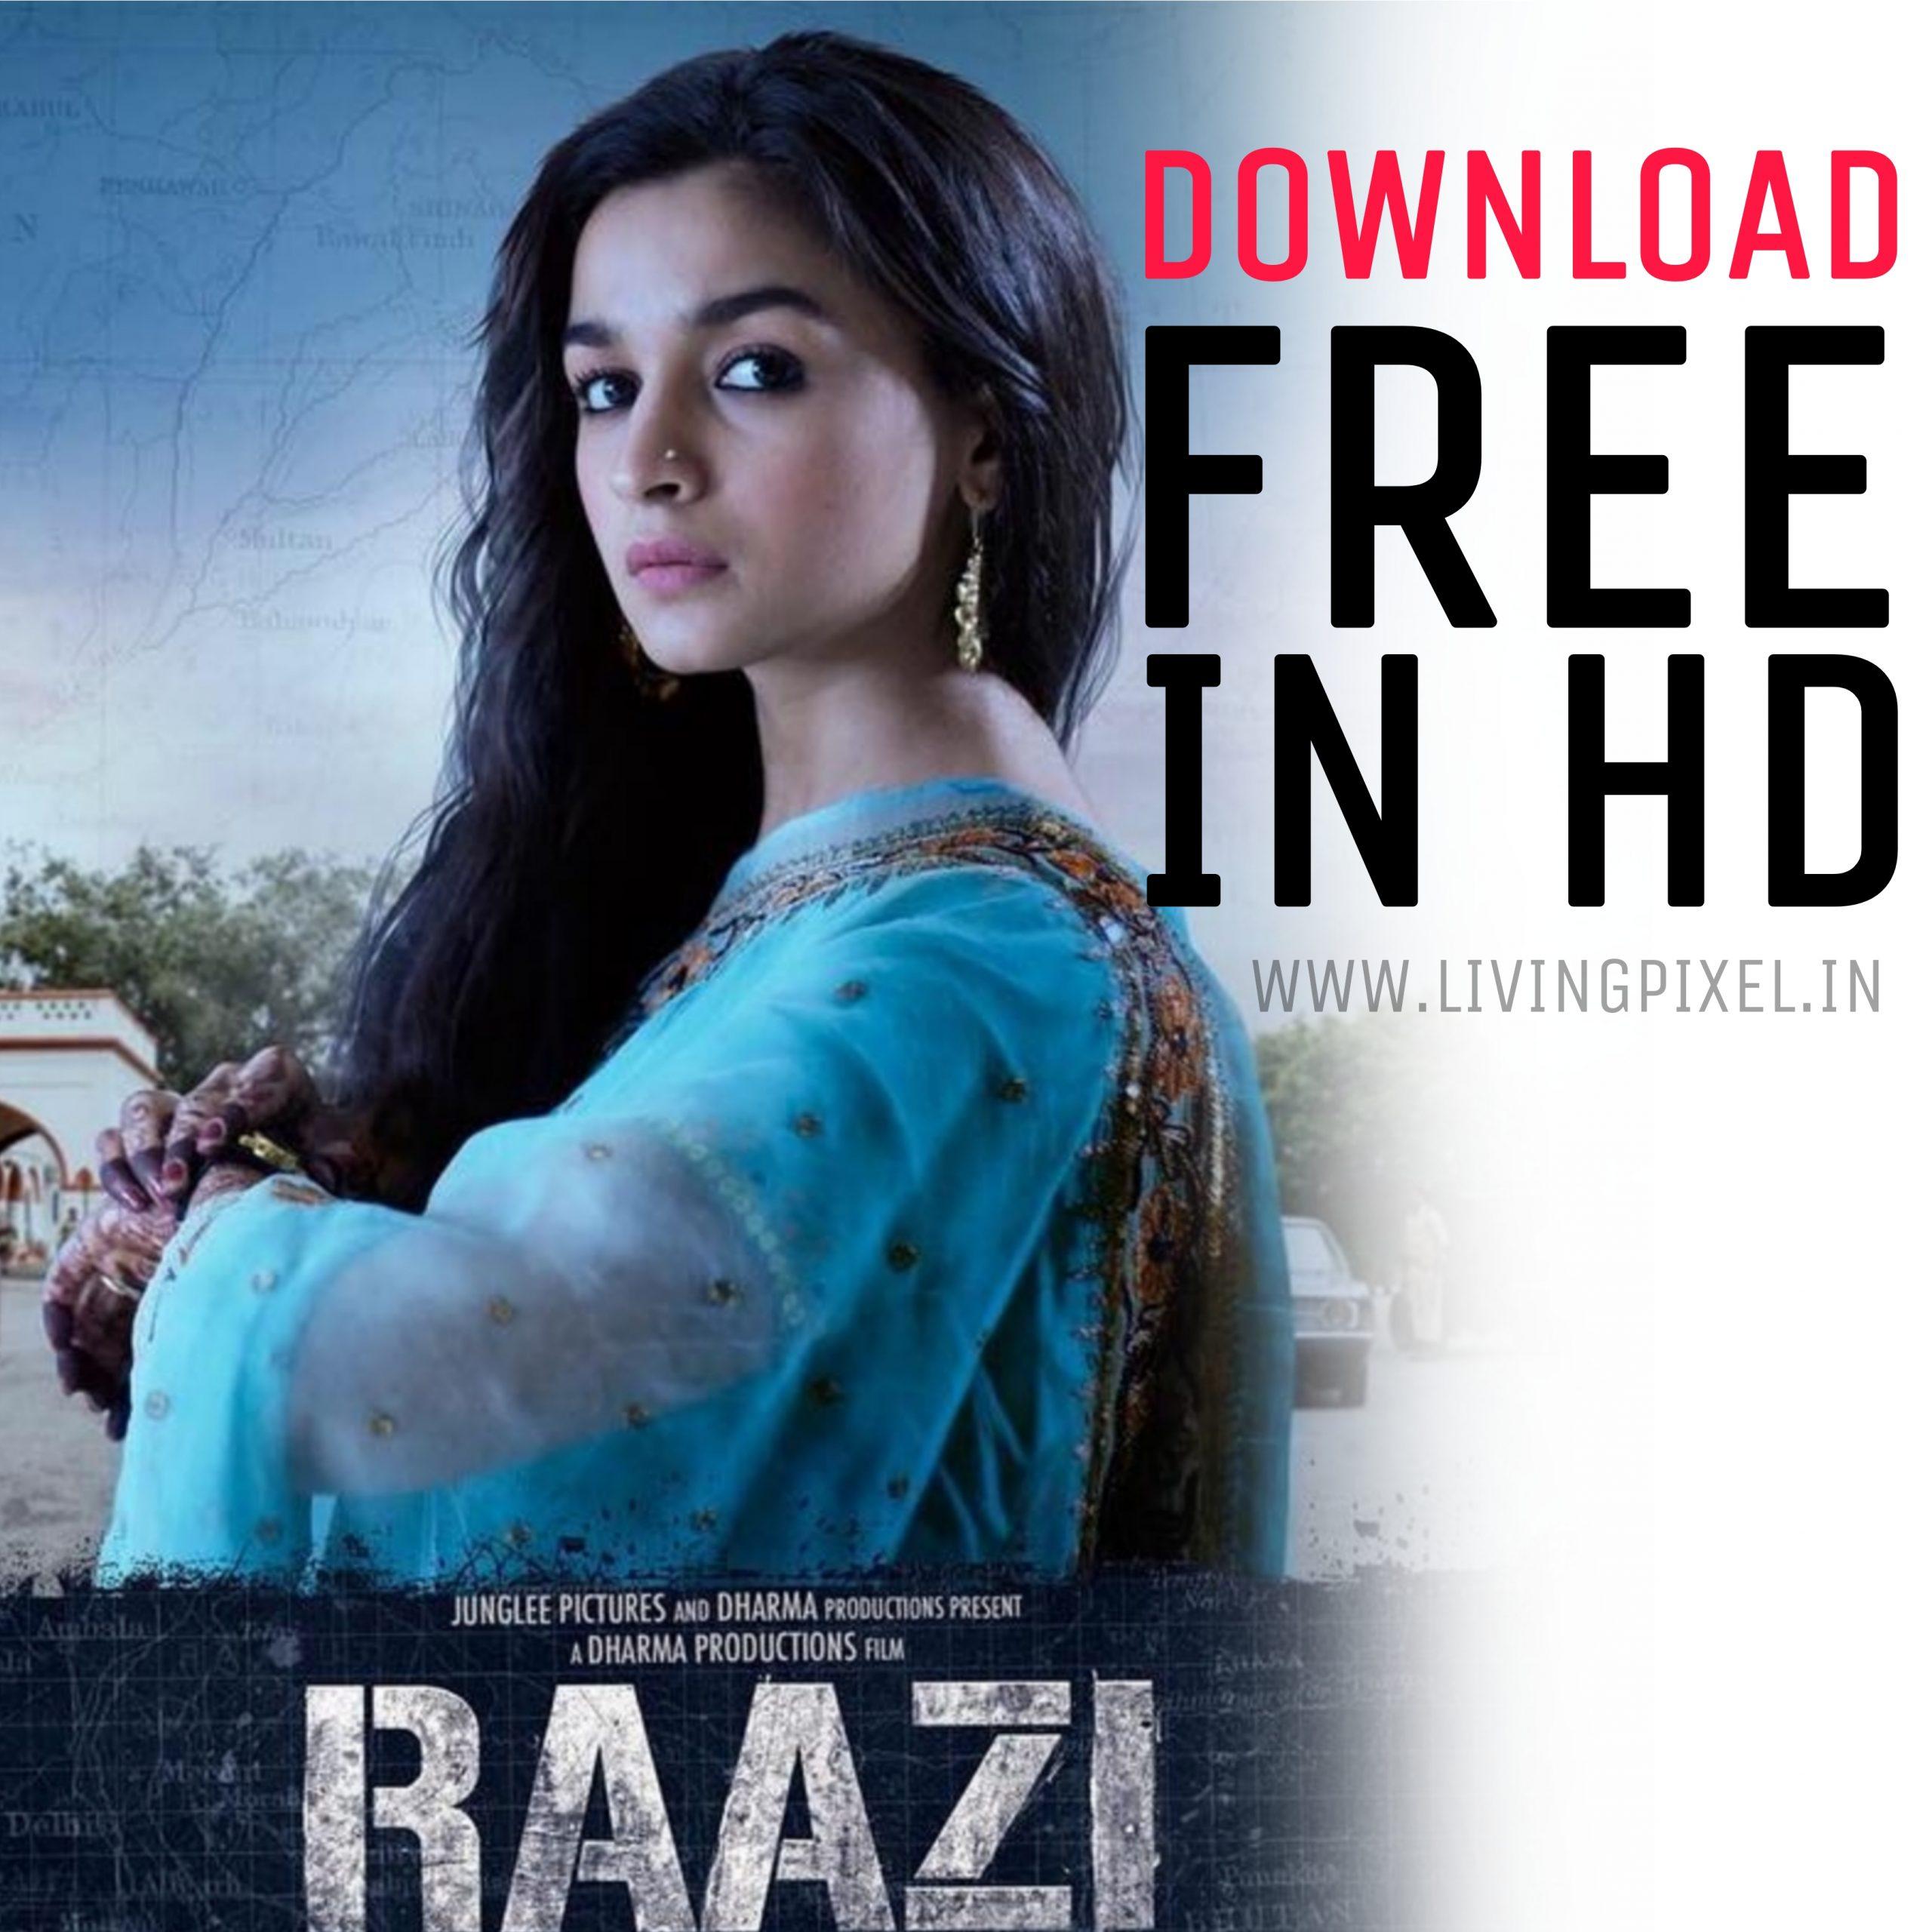 Raazi movie download Telegram in HD